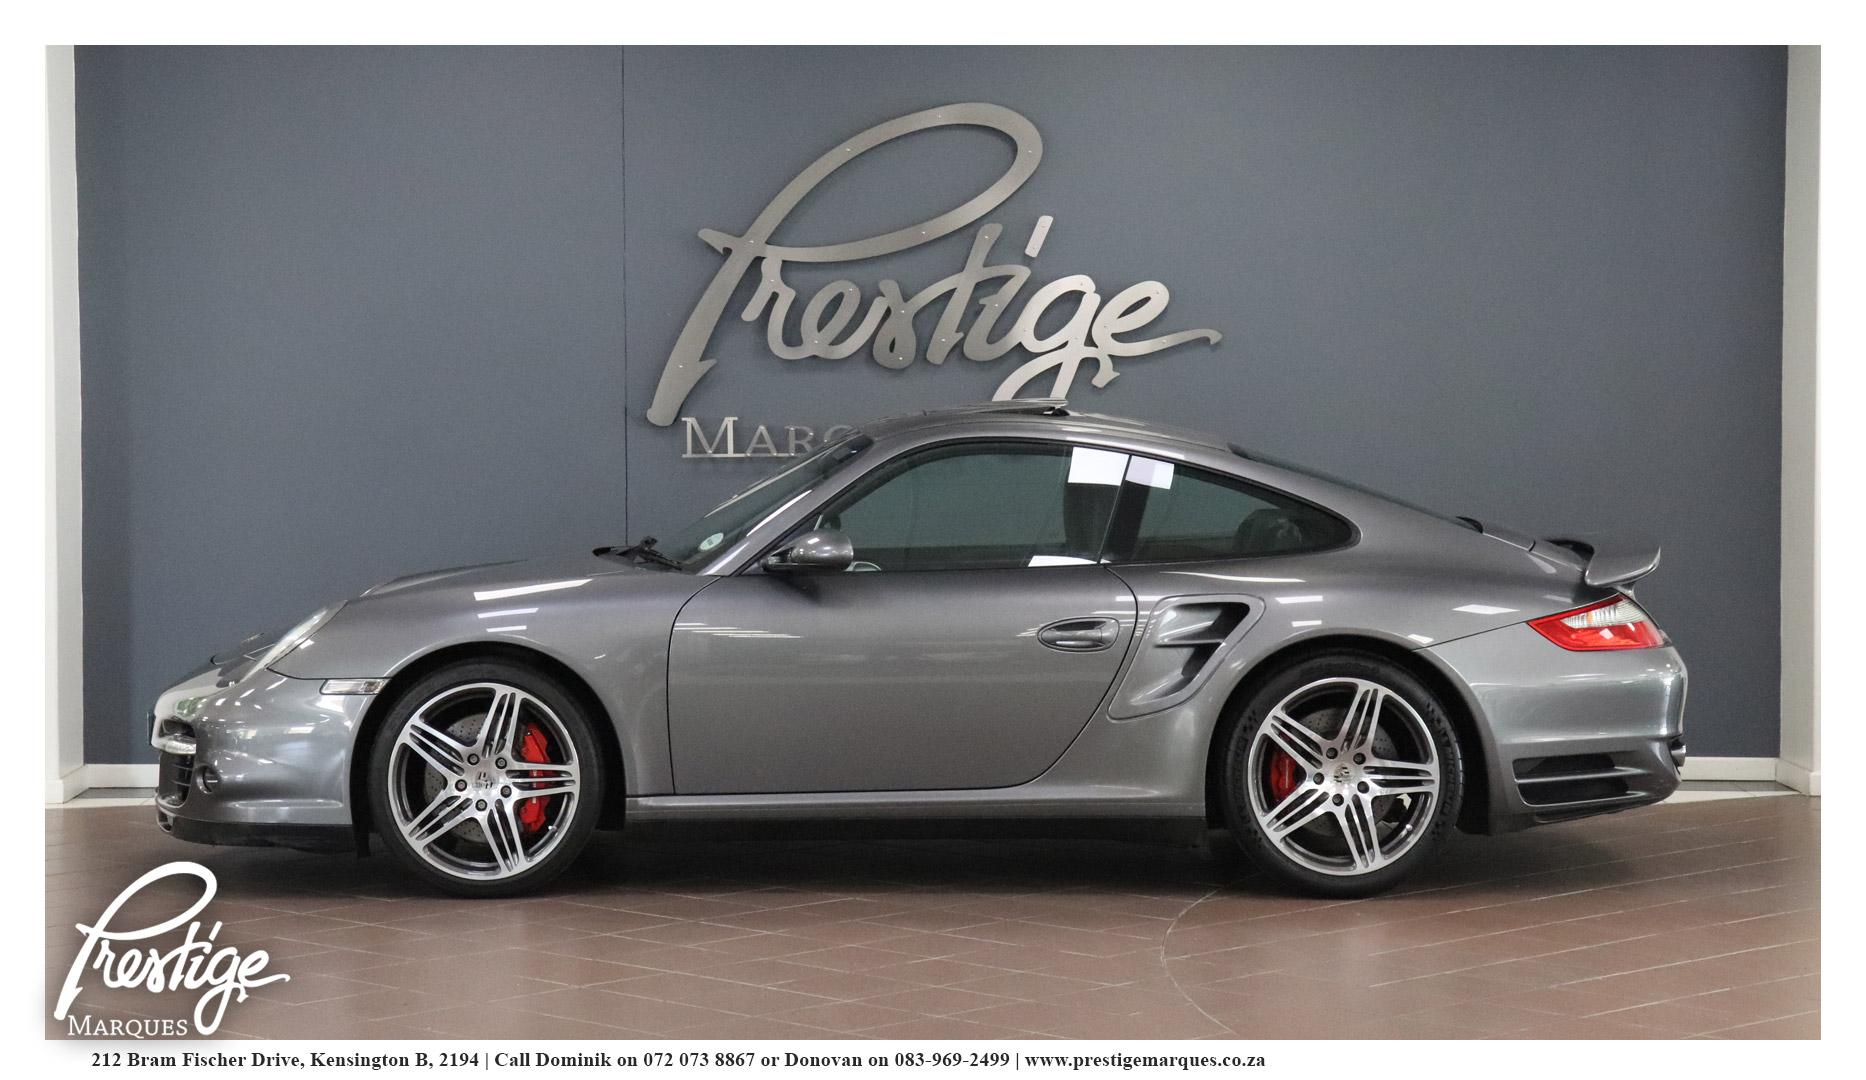 2008-Porsche-911-997-Turbo-Tiptronic-Prestige-Marques-Randburg-Sandton-6